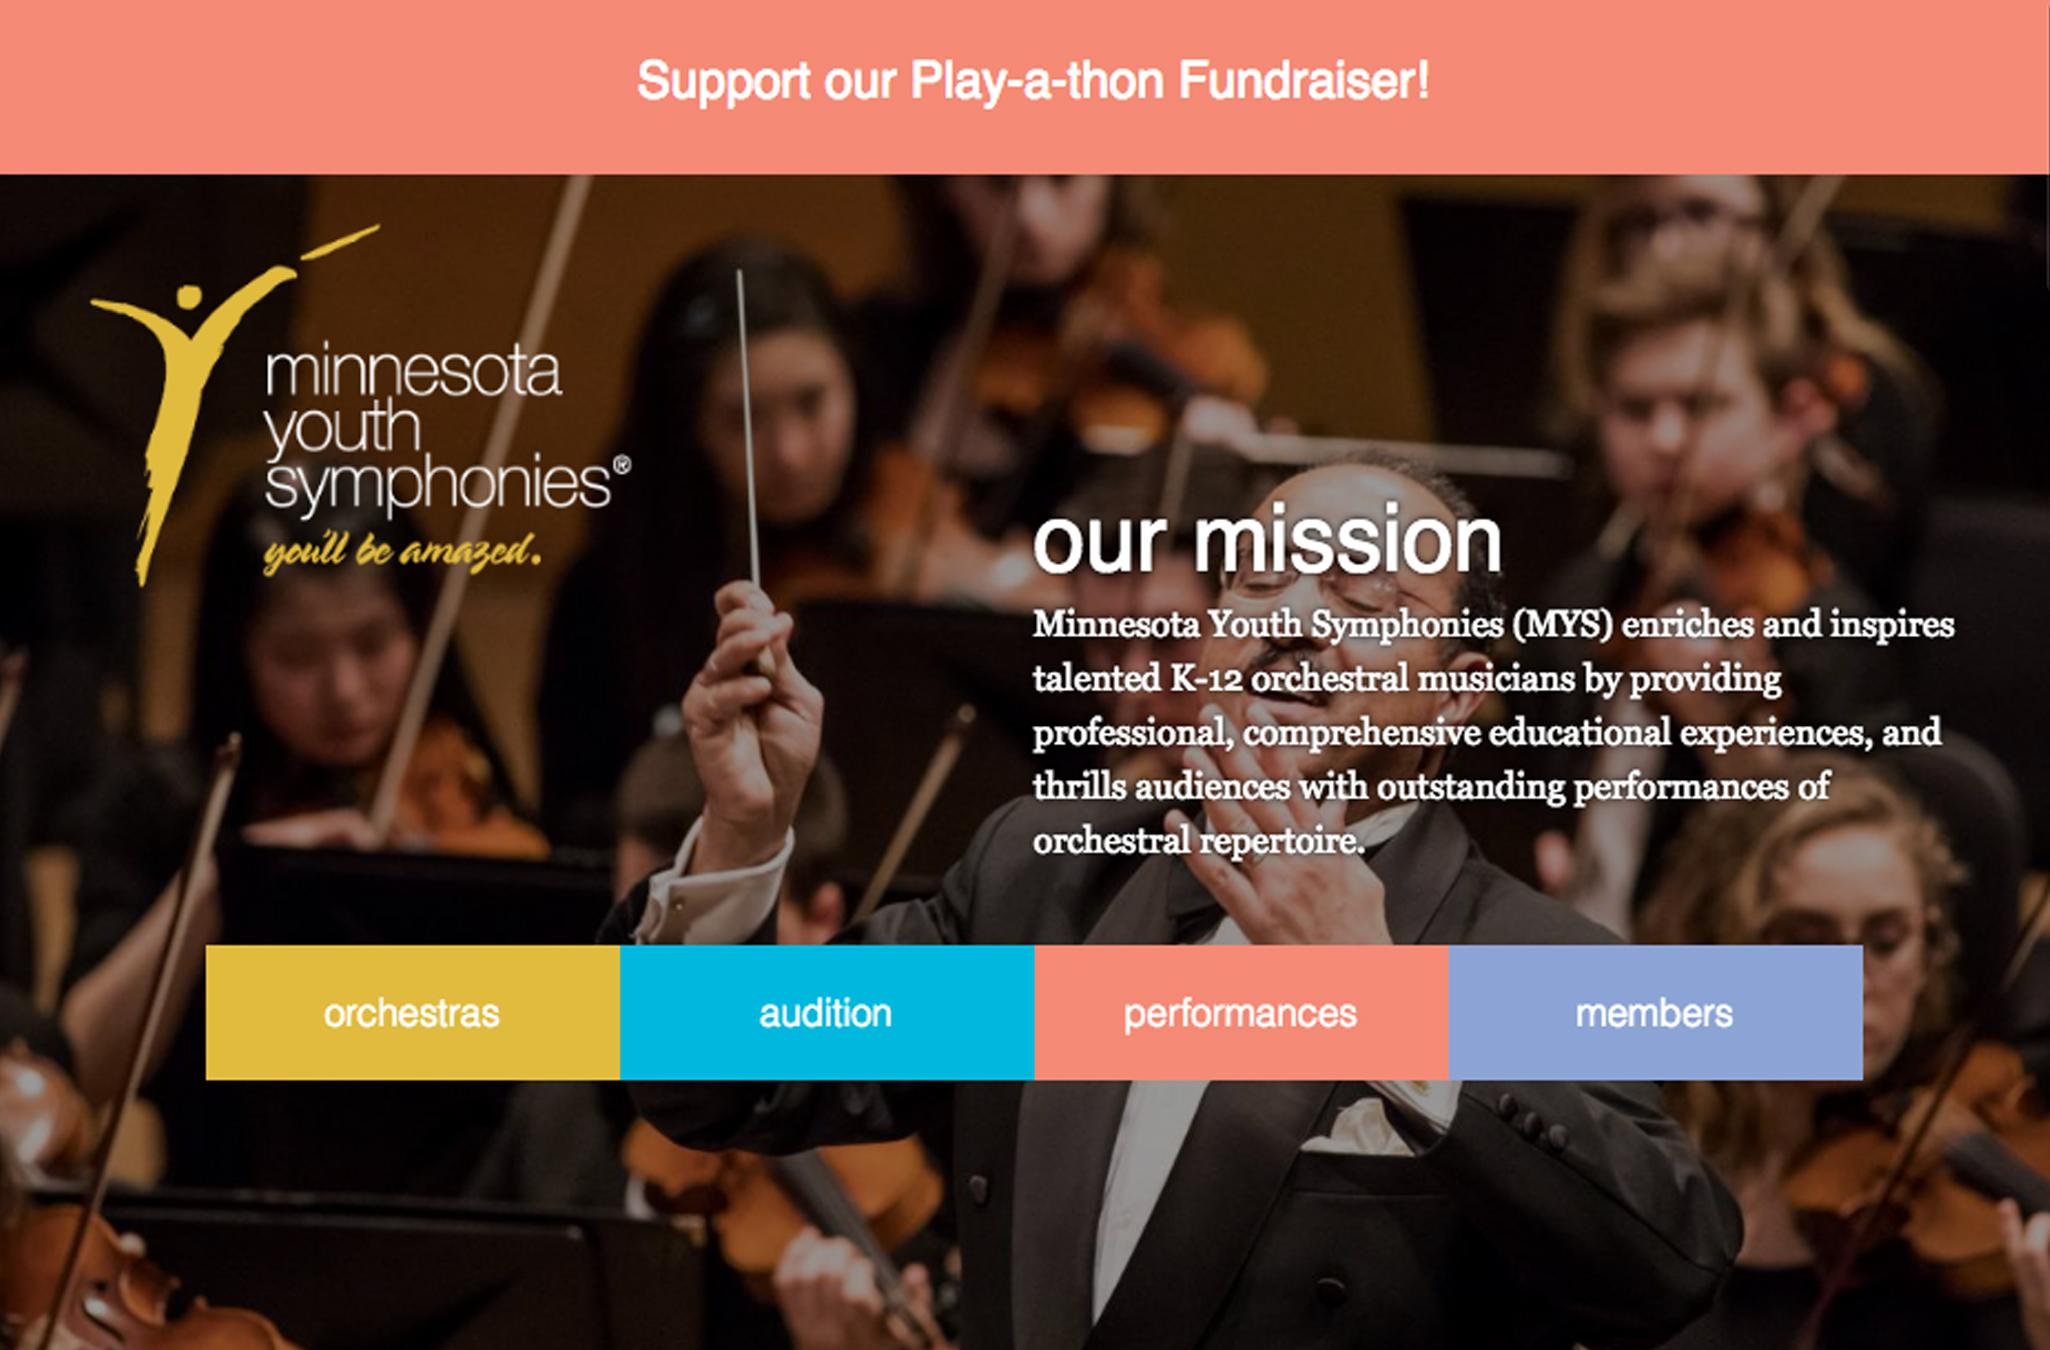 www.mnyouthsymphonies.org website